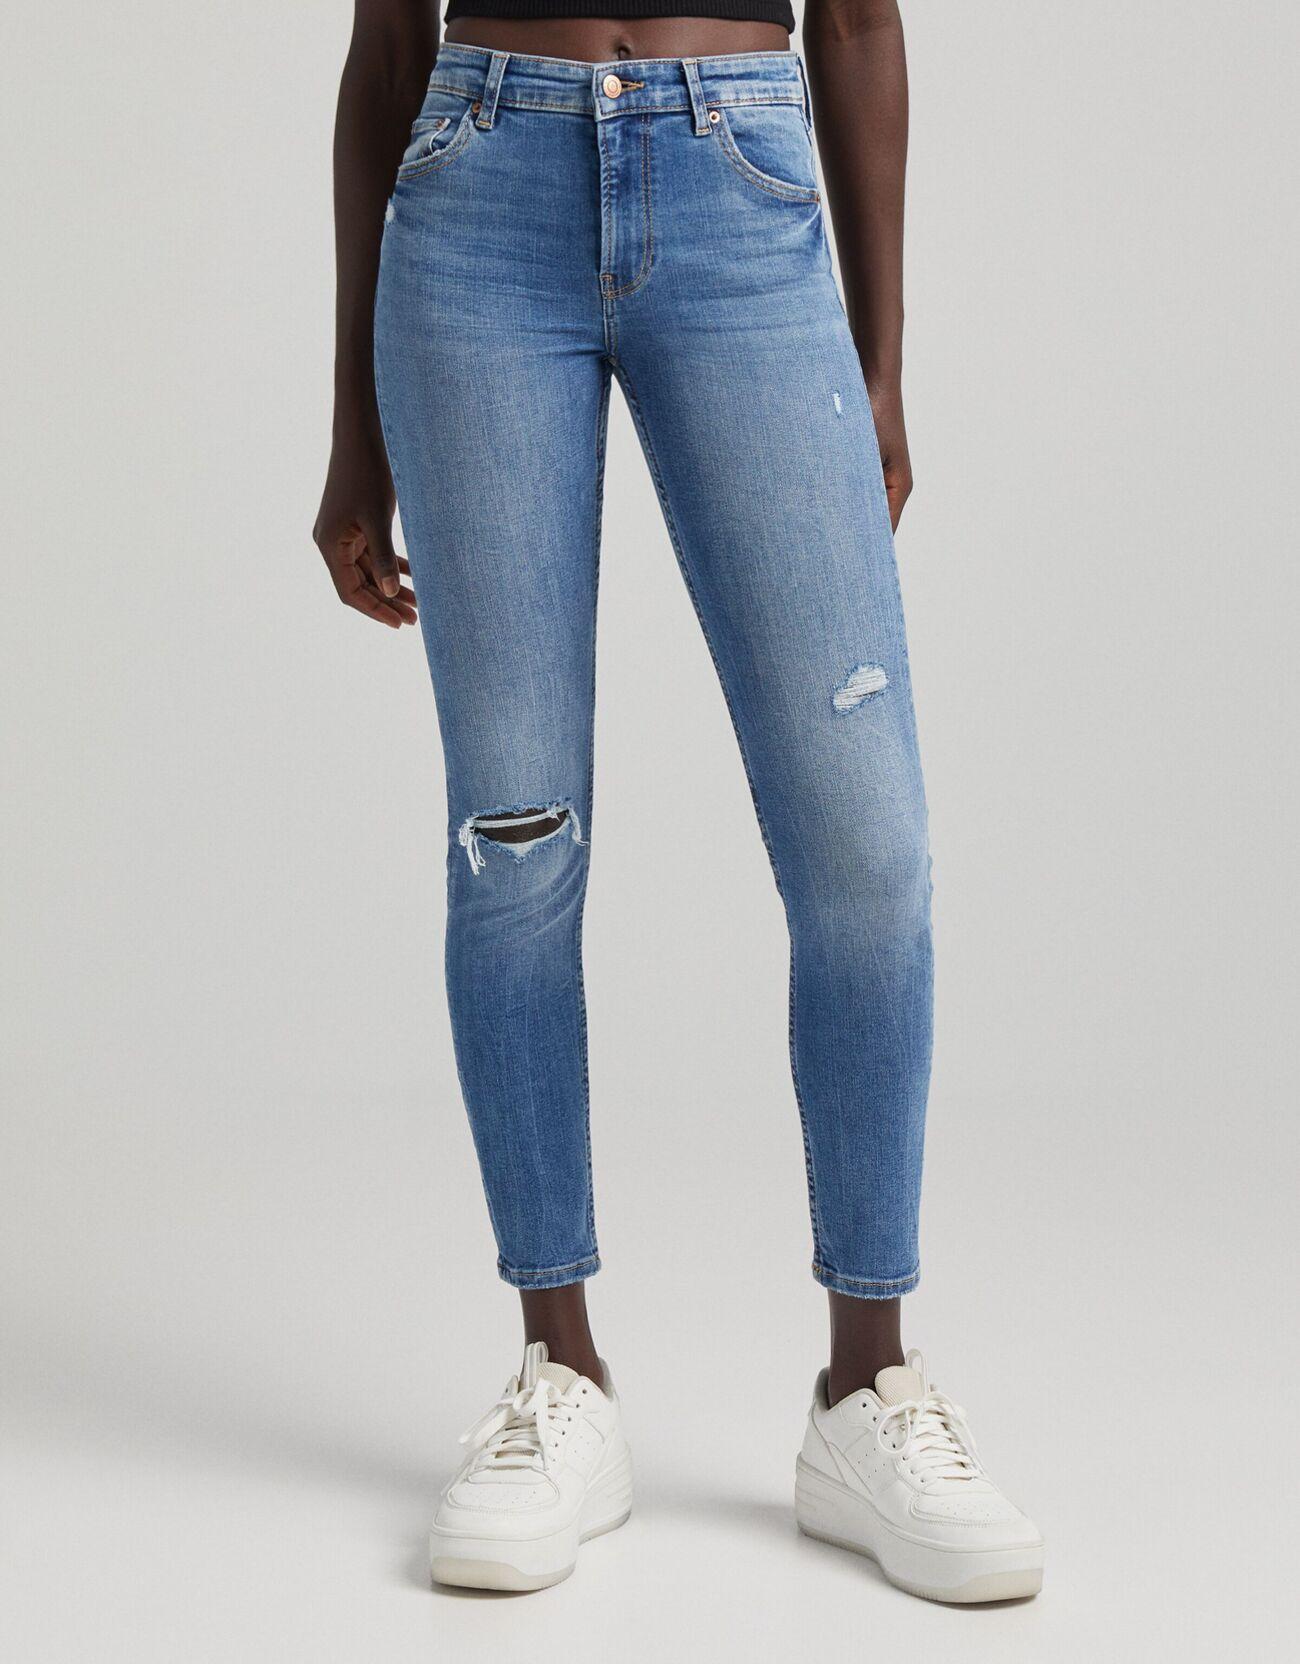 Bershka Jeans Skinny Low Waist Donna 46 (Eu 42) Azzurro